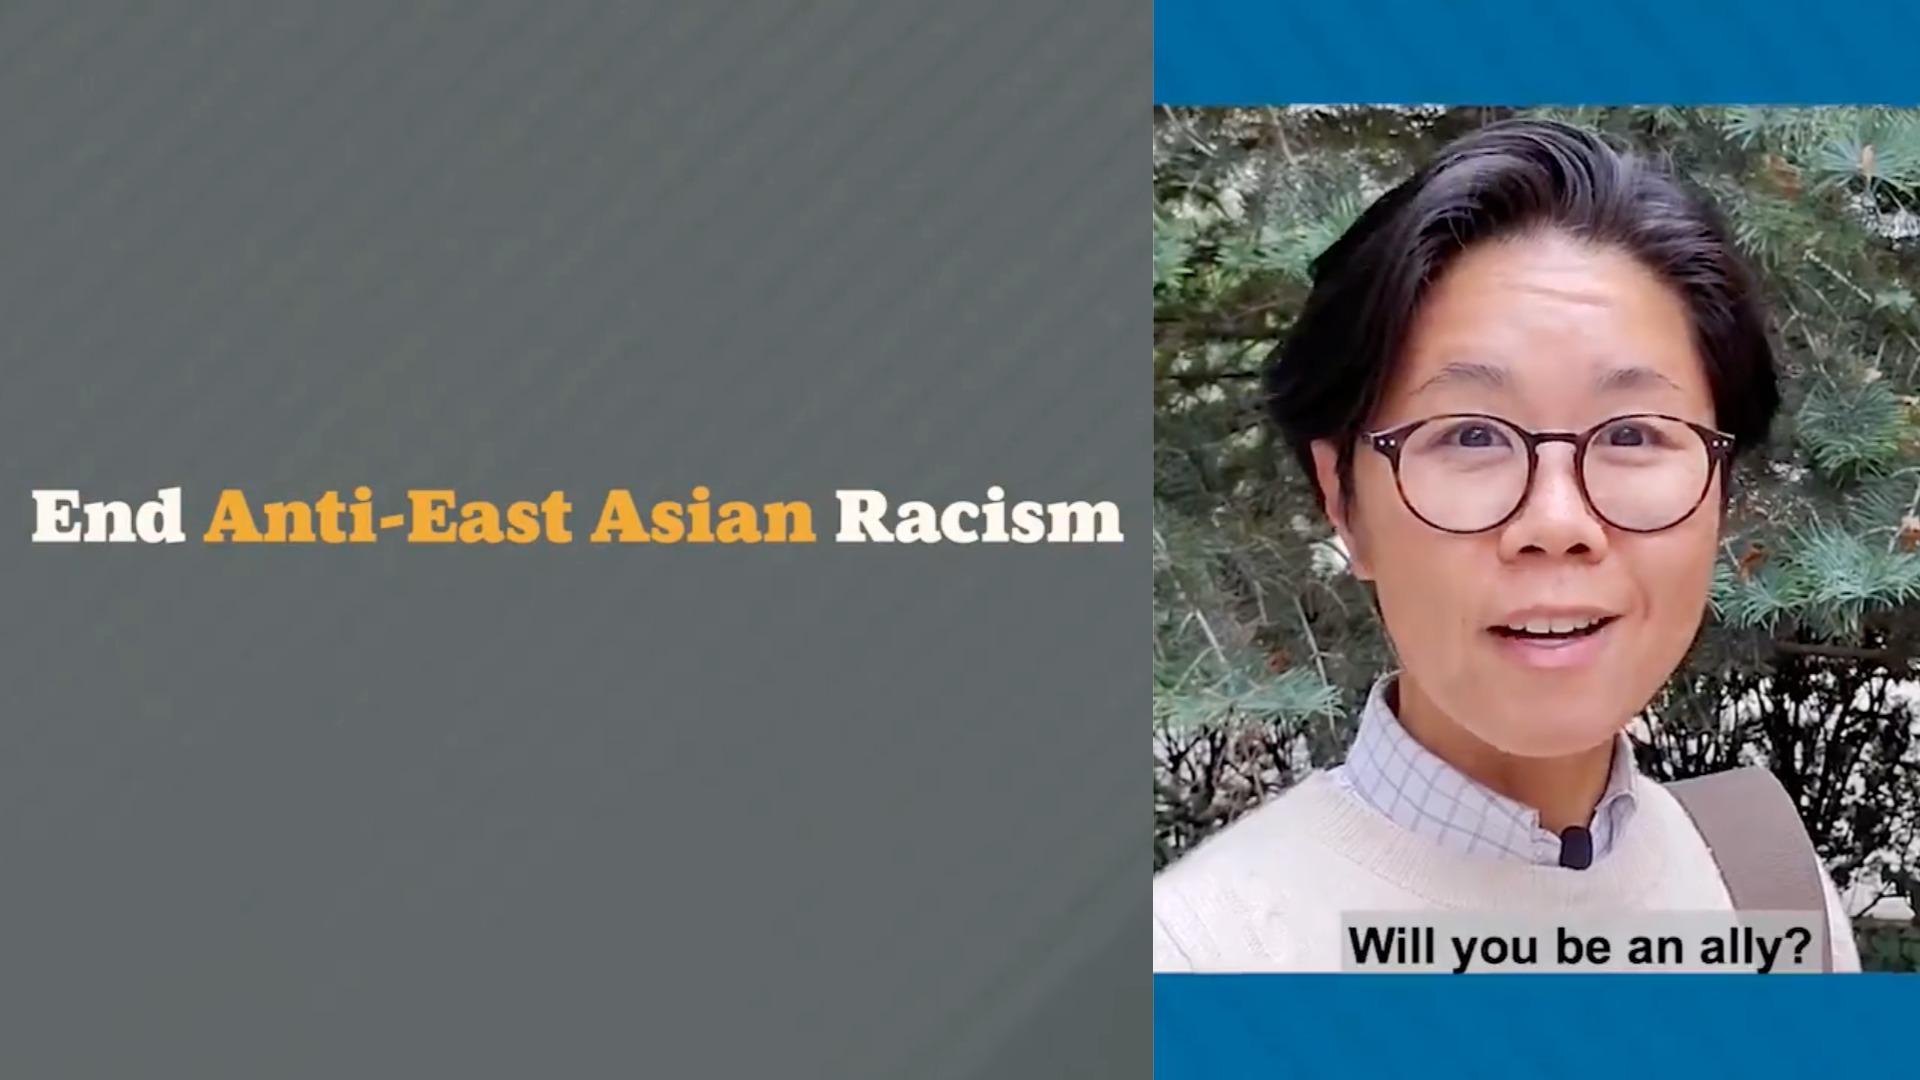 www.weareresonate.com: Toronto launches campaign to combat anti-East Asian Coronavirus racism